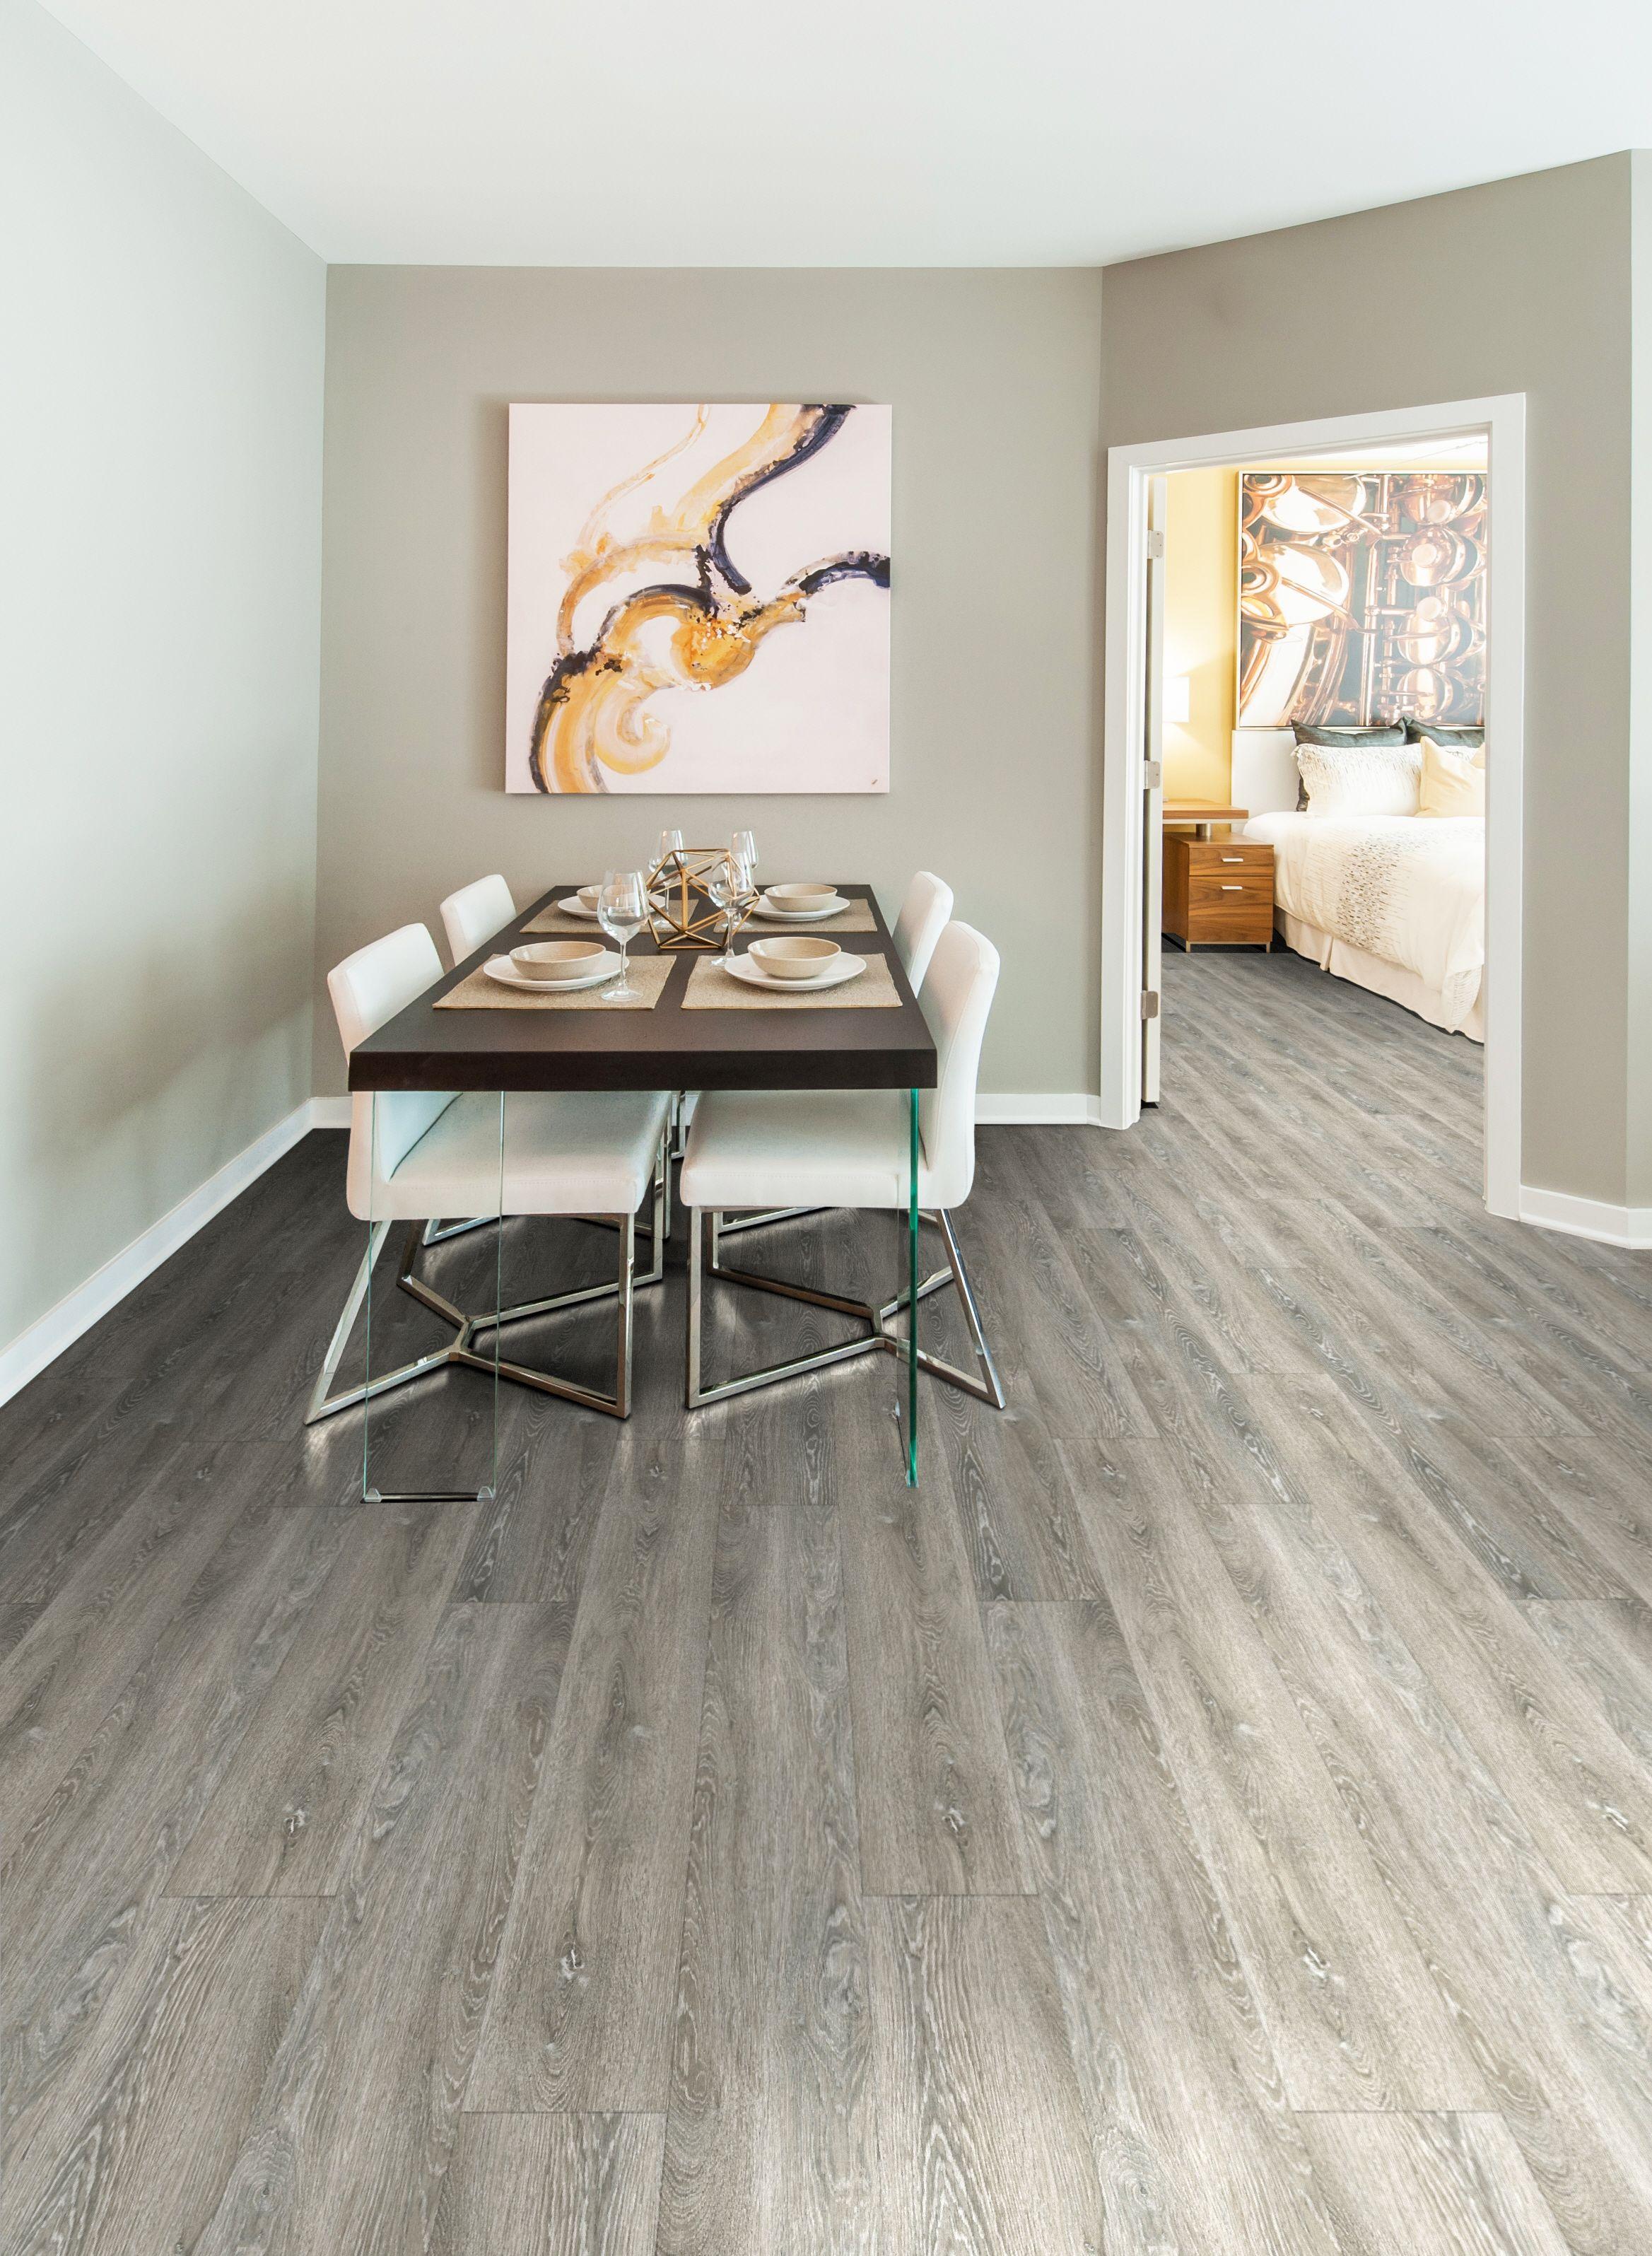 Merveilleux Luxury Vinyl Tile Is The Perfect Addition With Carpet Tiles, Broadloom  Carpet And Custom Rugs! #Flooring #LVT #Tile #design #office  #interiordesign ...